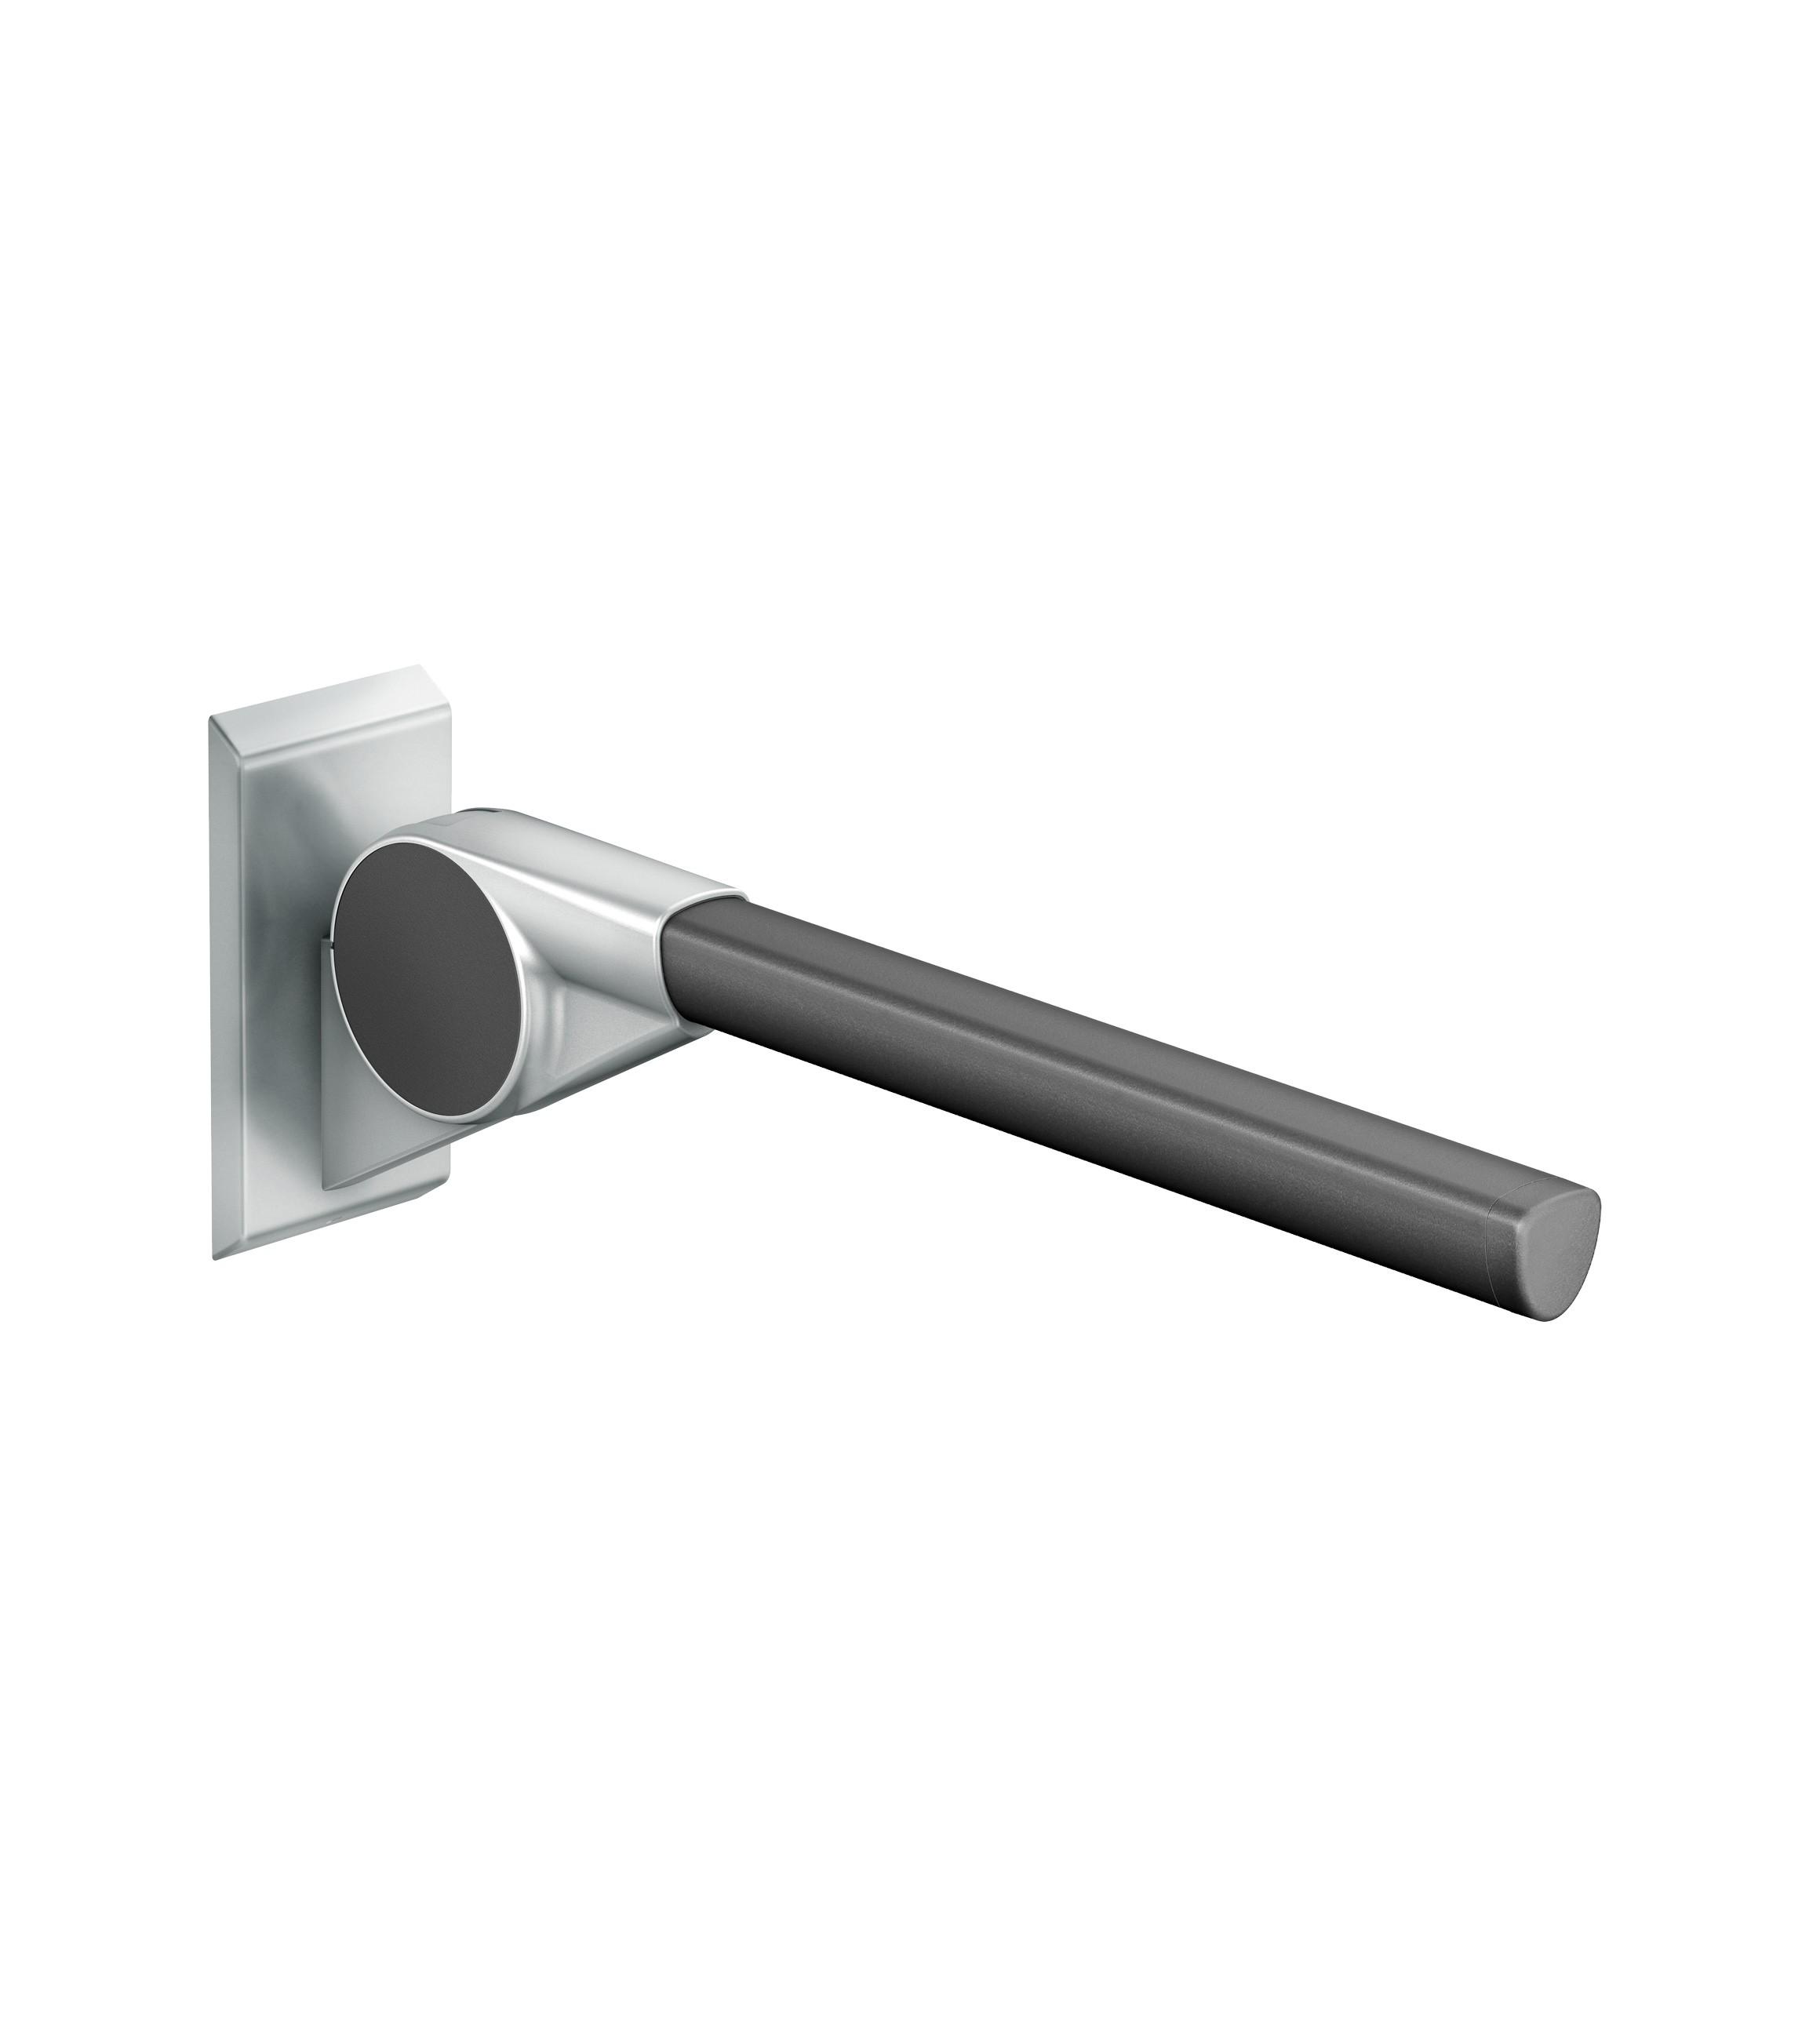 FSB Stützklappgriff 900 mm Ergo A100 Anthrazitgrau metallinksc (0 82 8420 00090 8809)